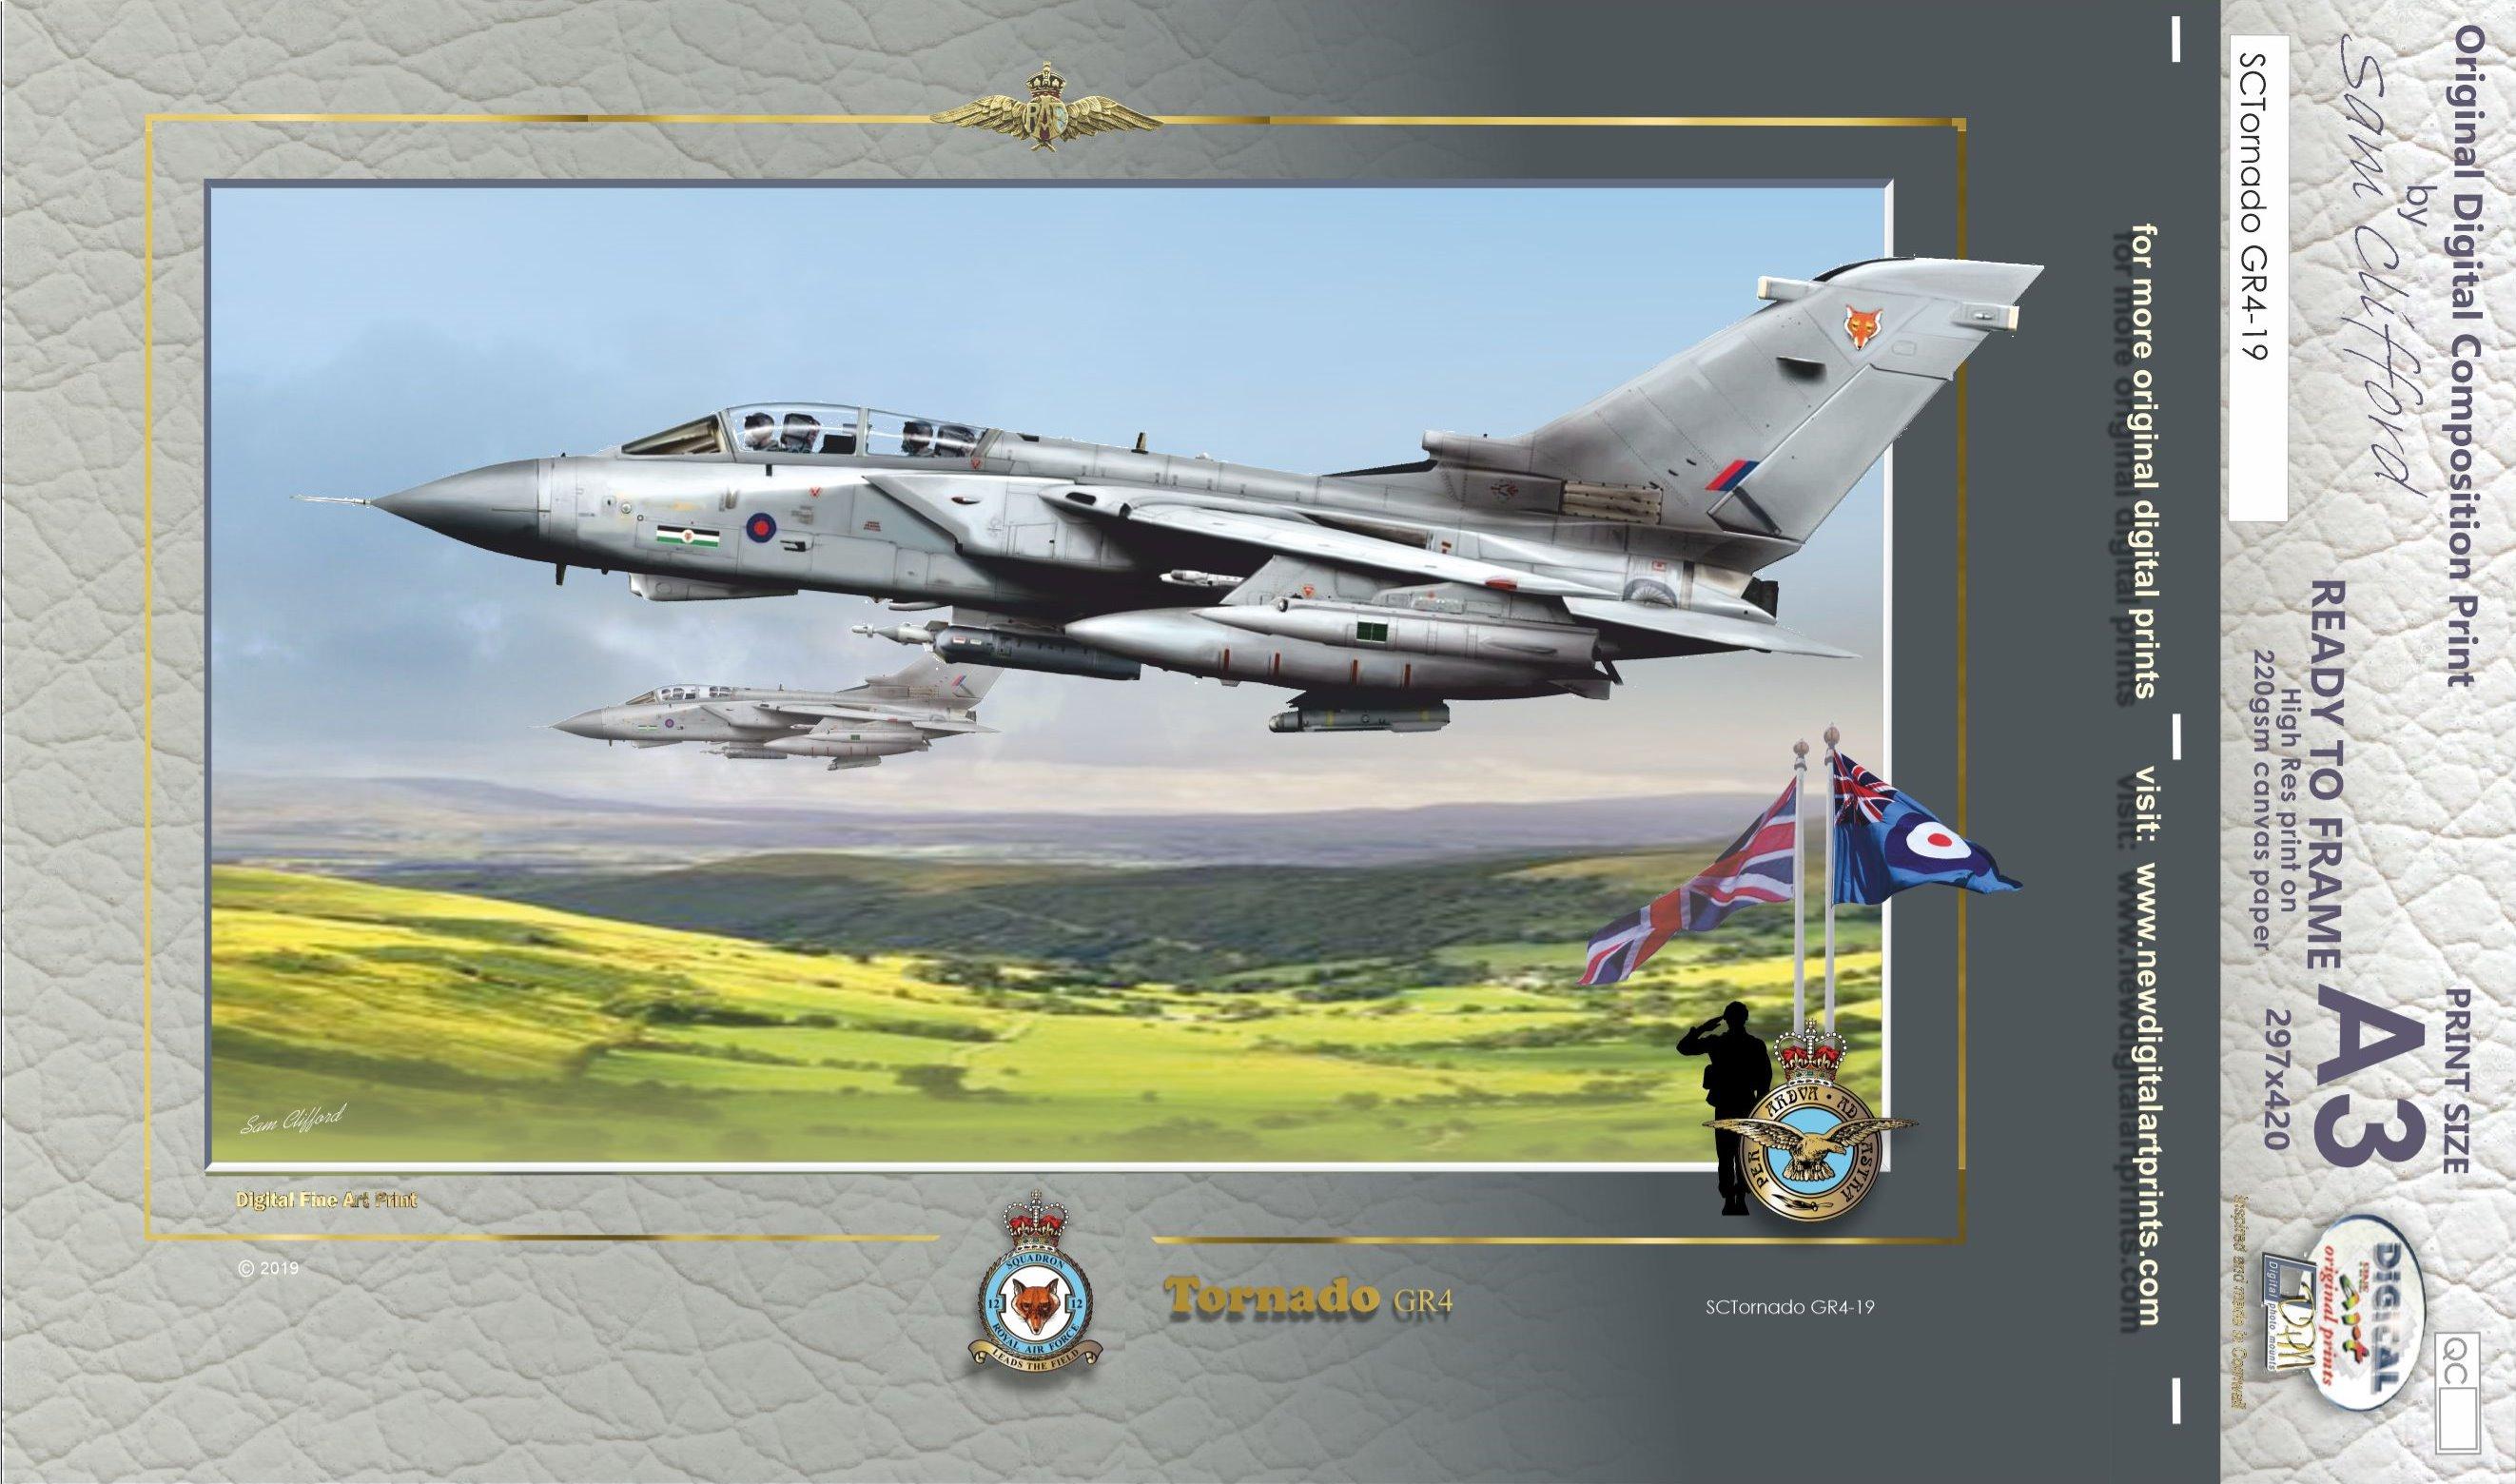 print code: SC jet-01-19